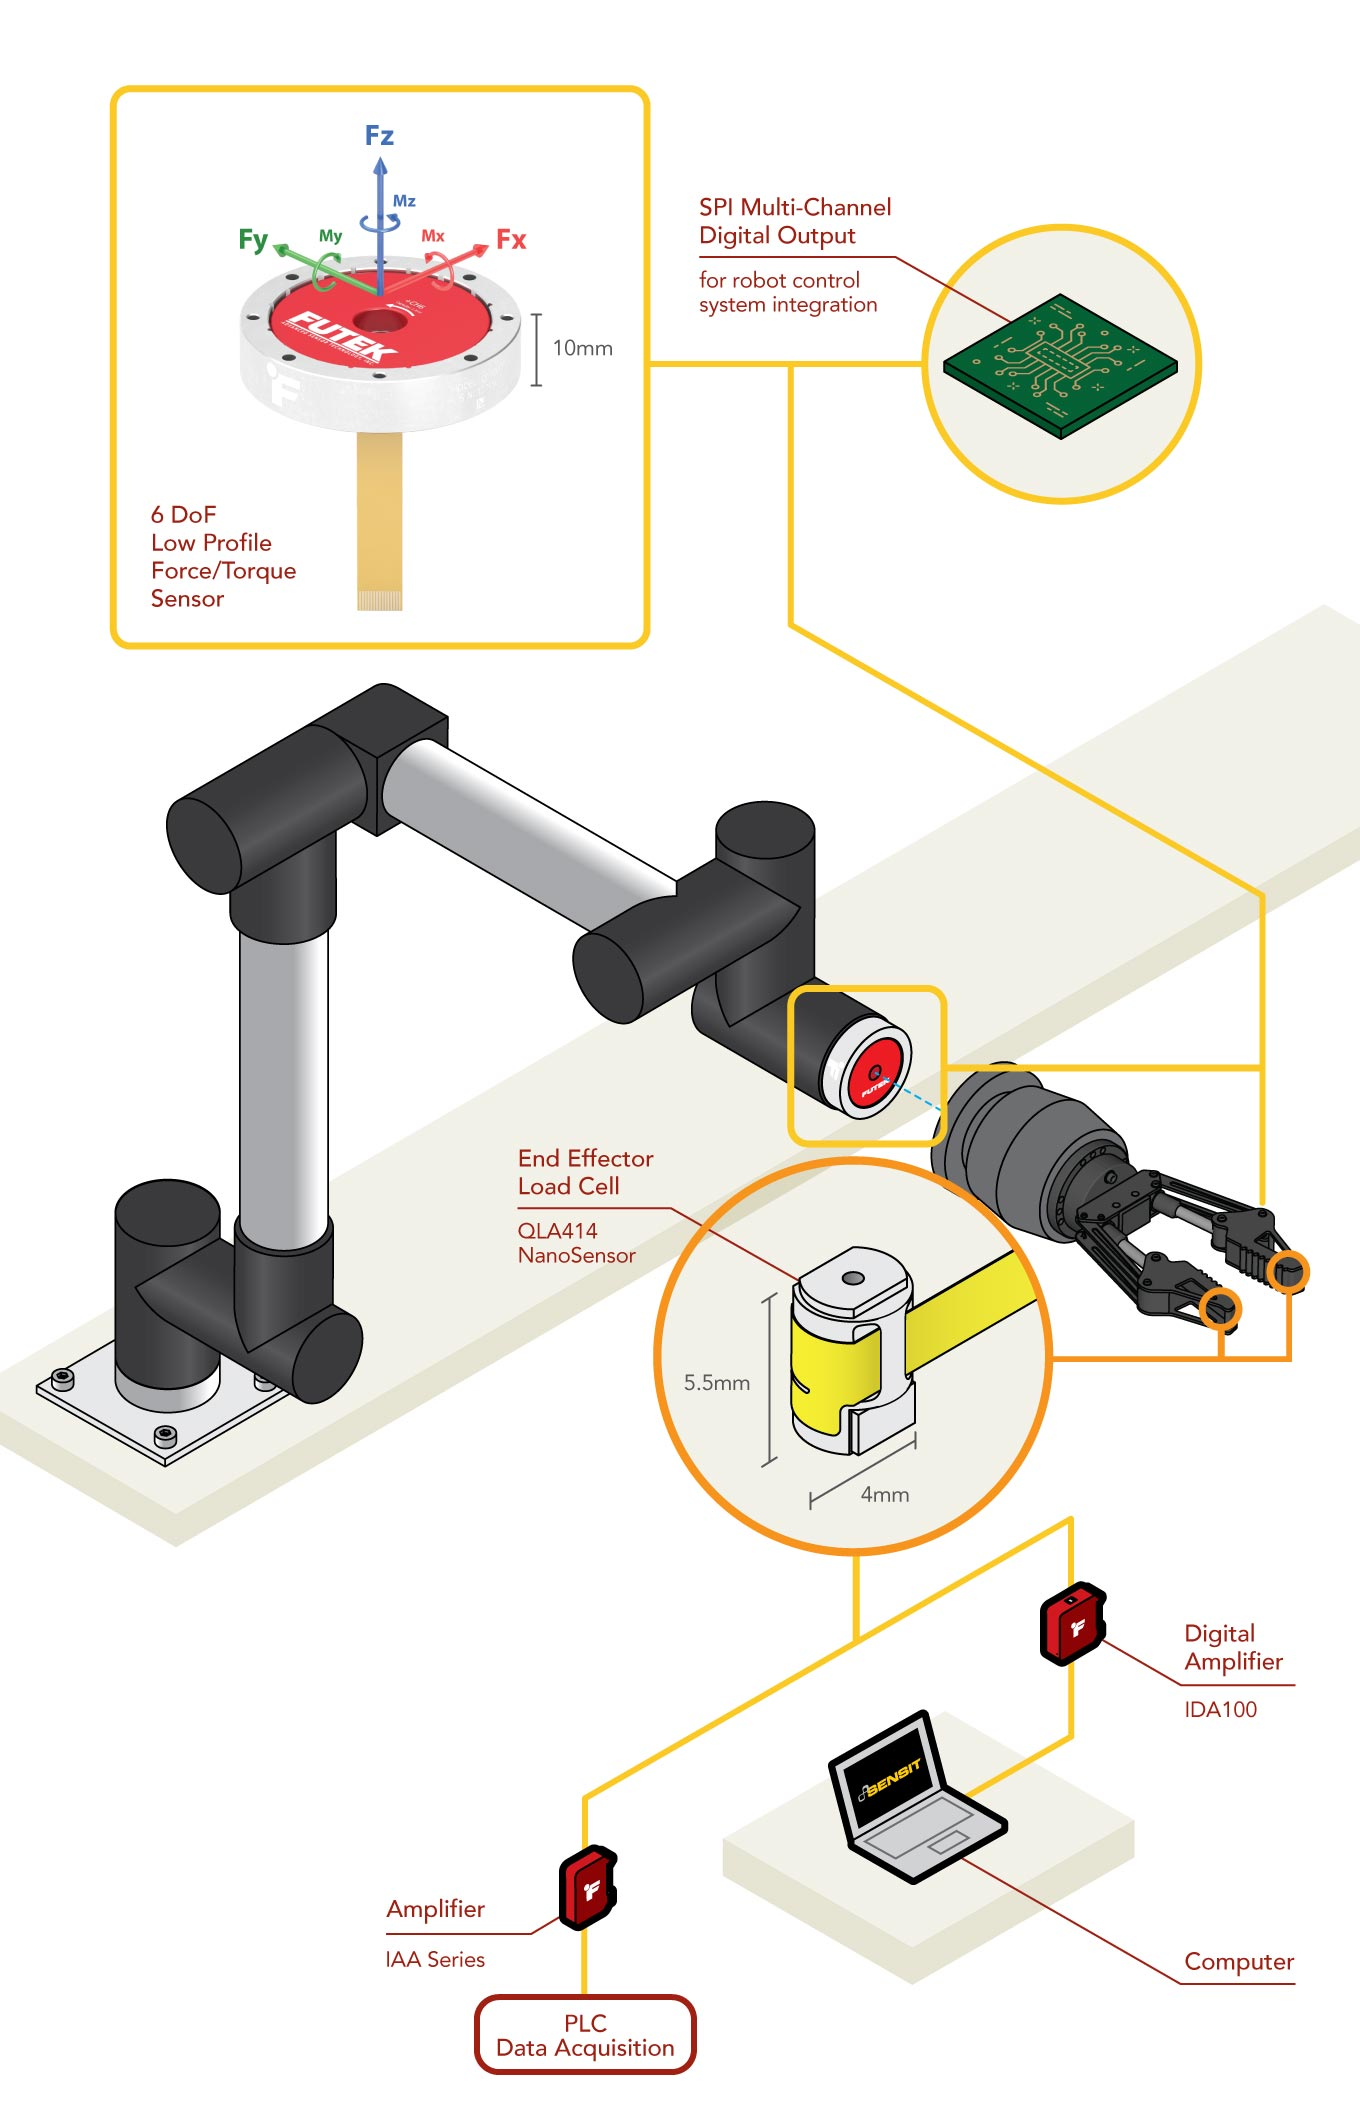 6 Axis Force Sensor 6 DoF Force Torque Load Cell Sensor